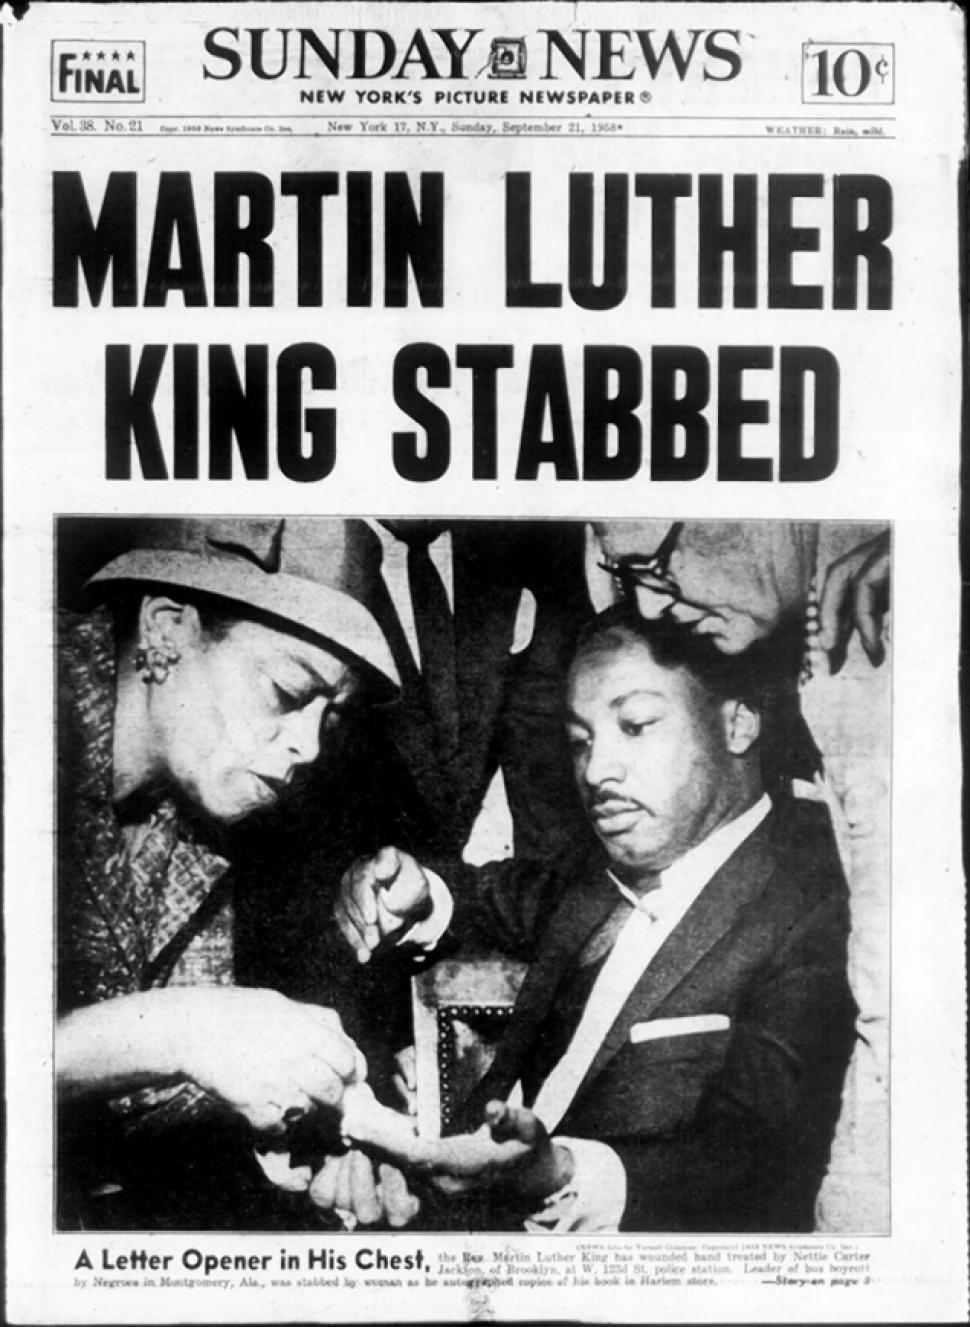 Newspaper report of the stabbing.